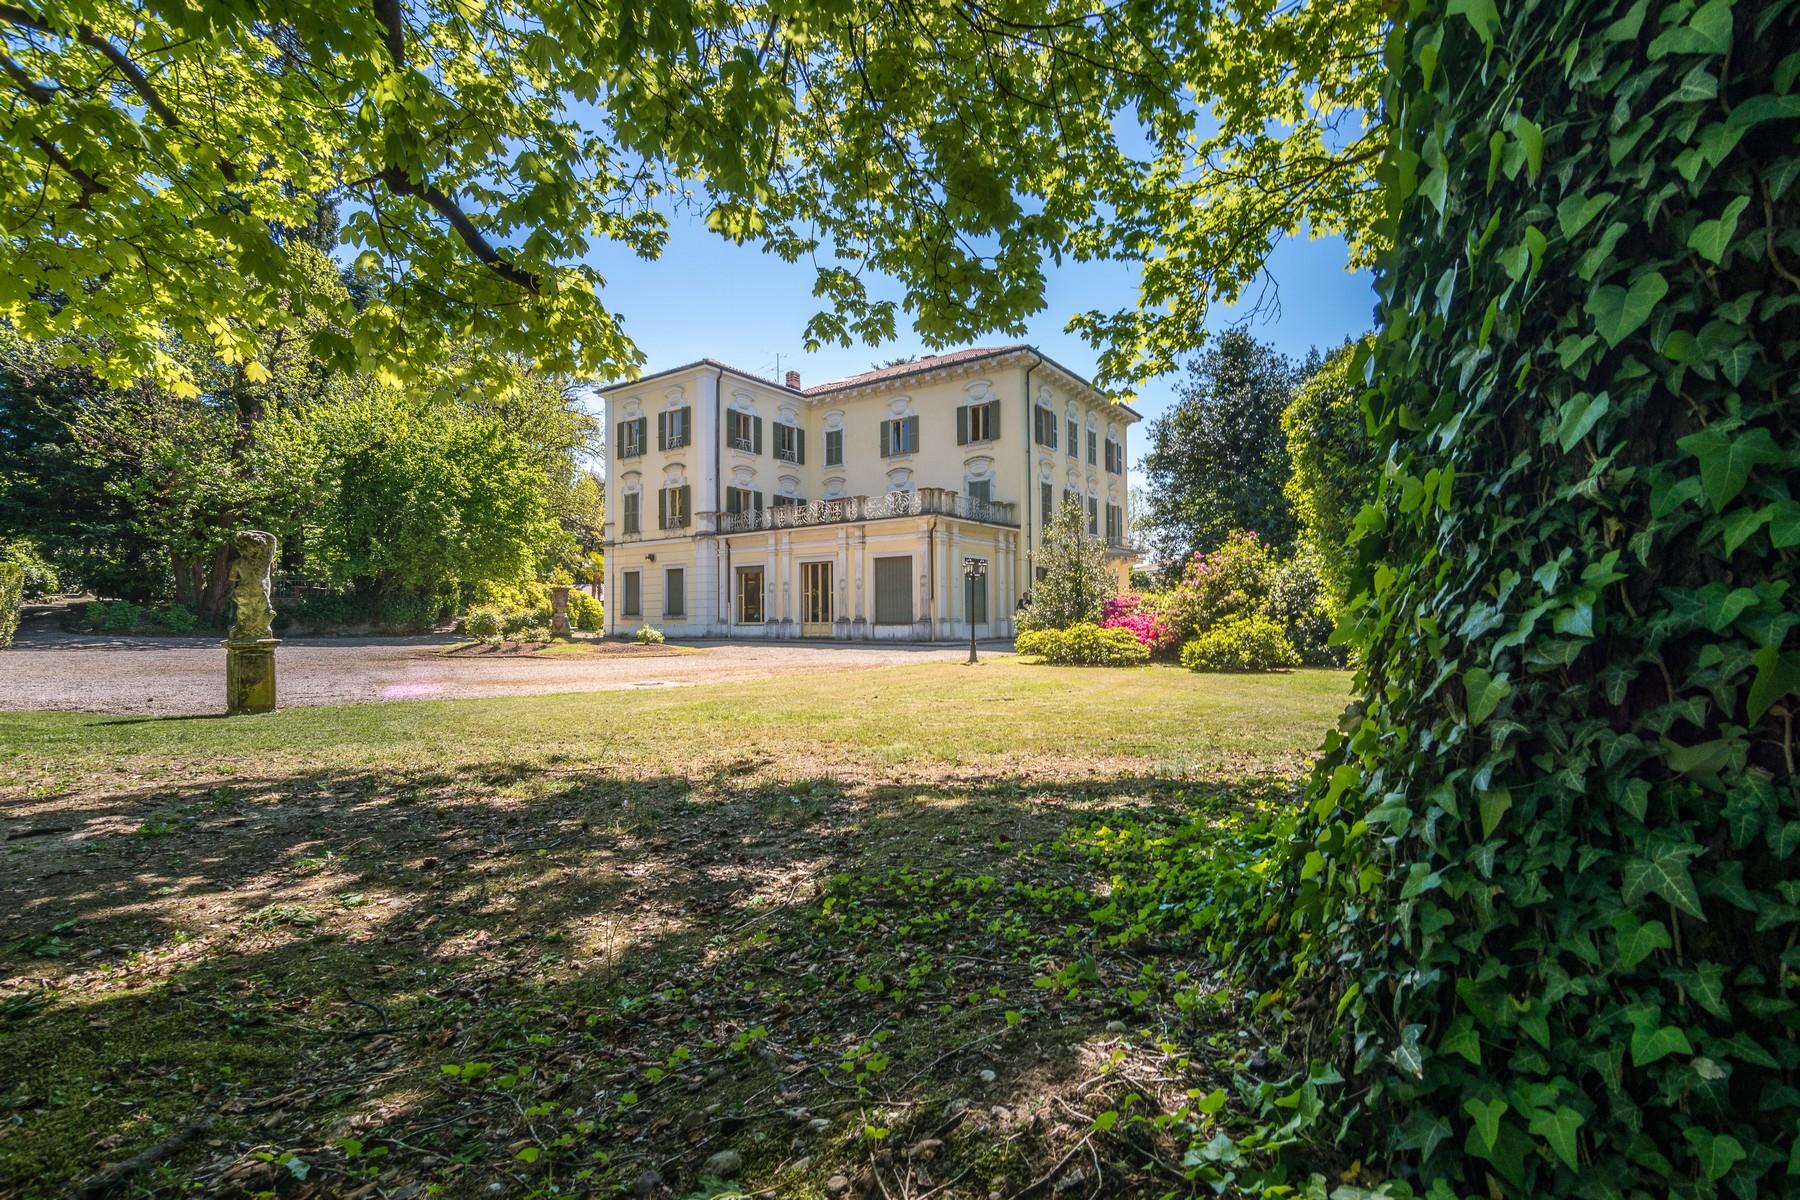 Villa in Vendita a Varese: 5 locali, 1500 mq - Foto 9